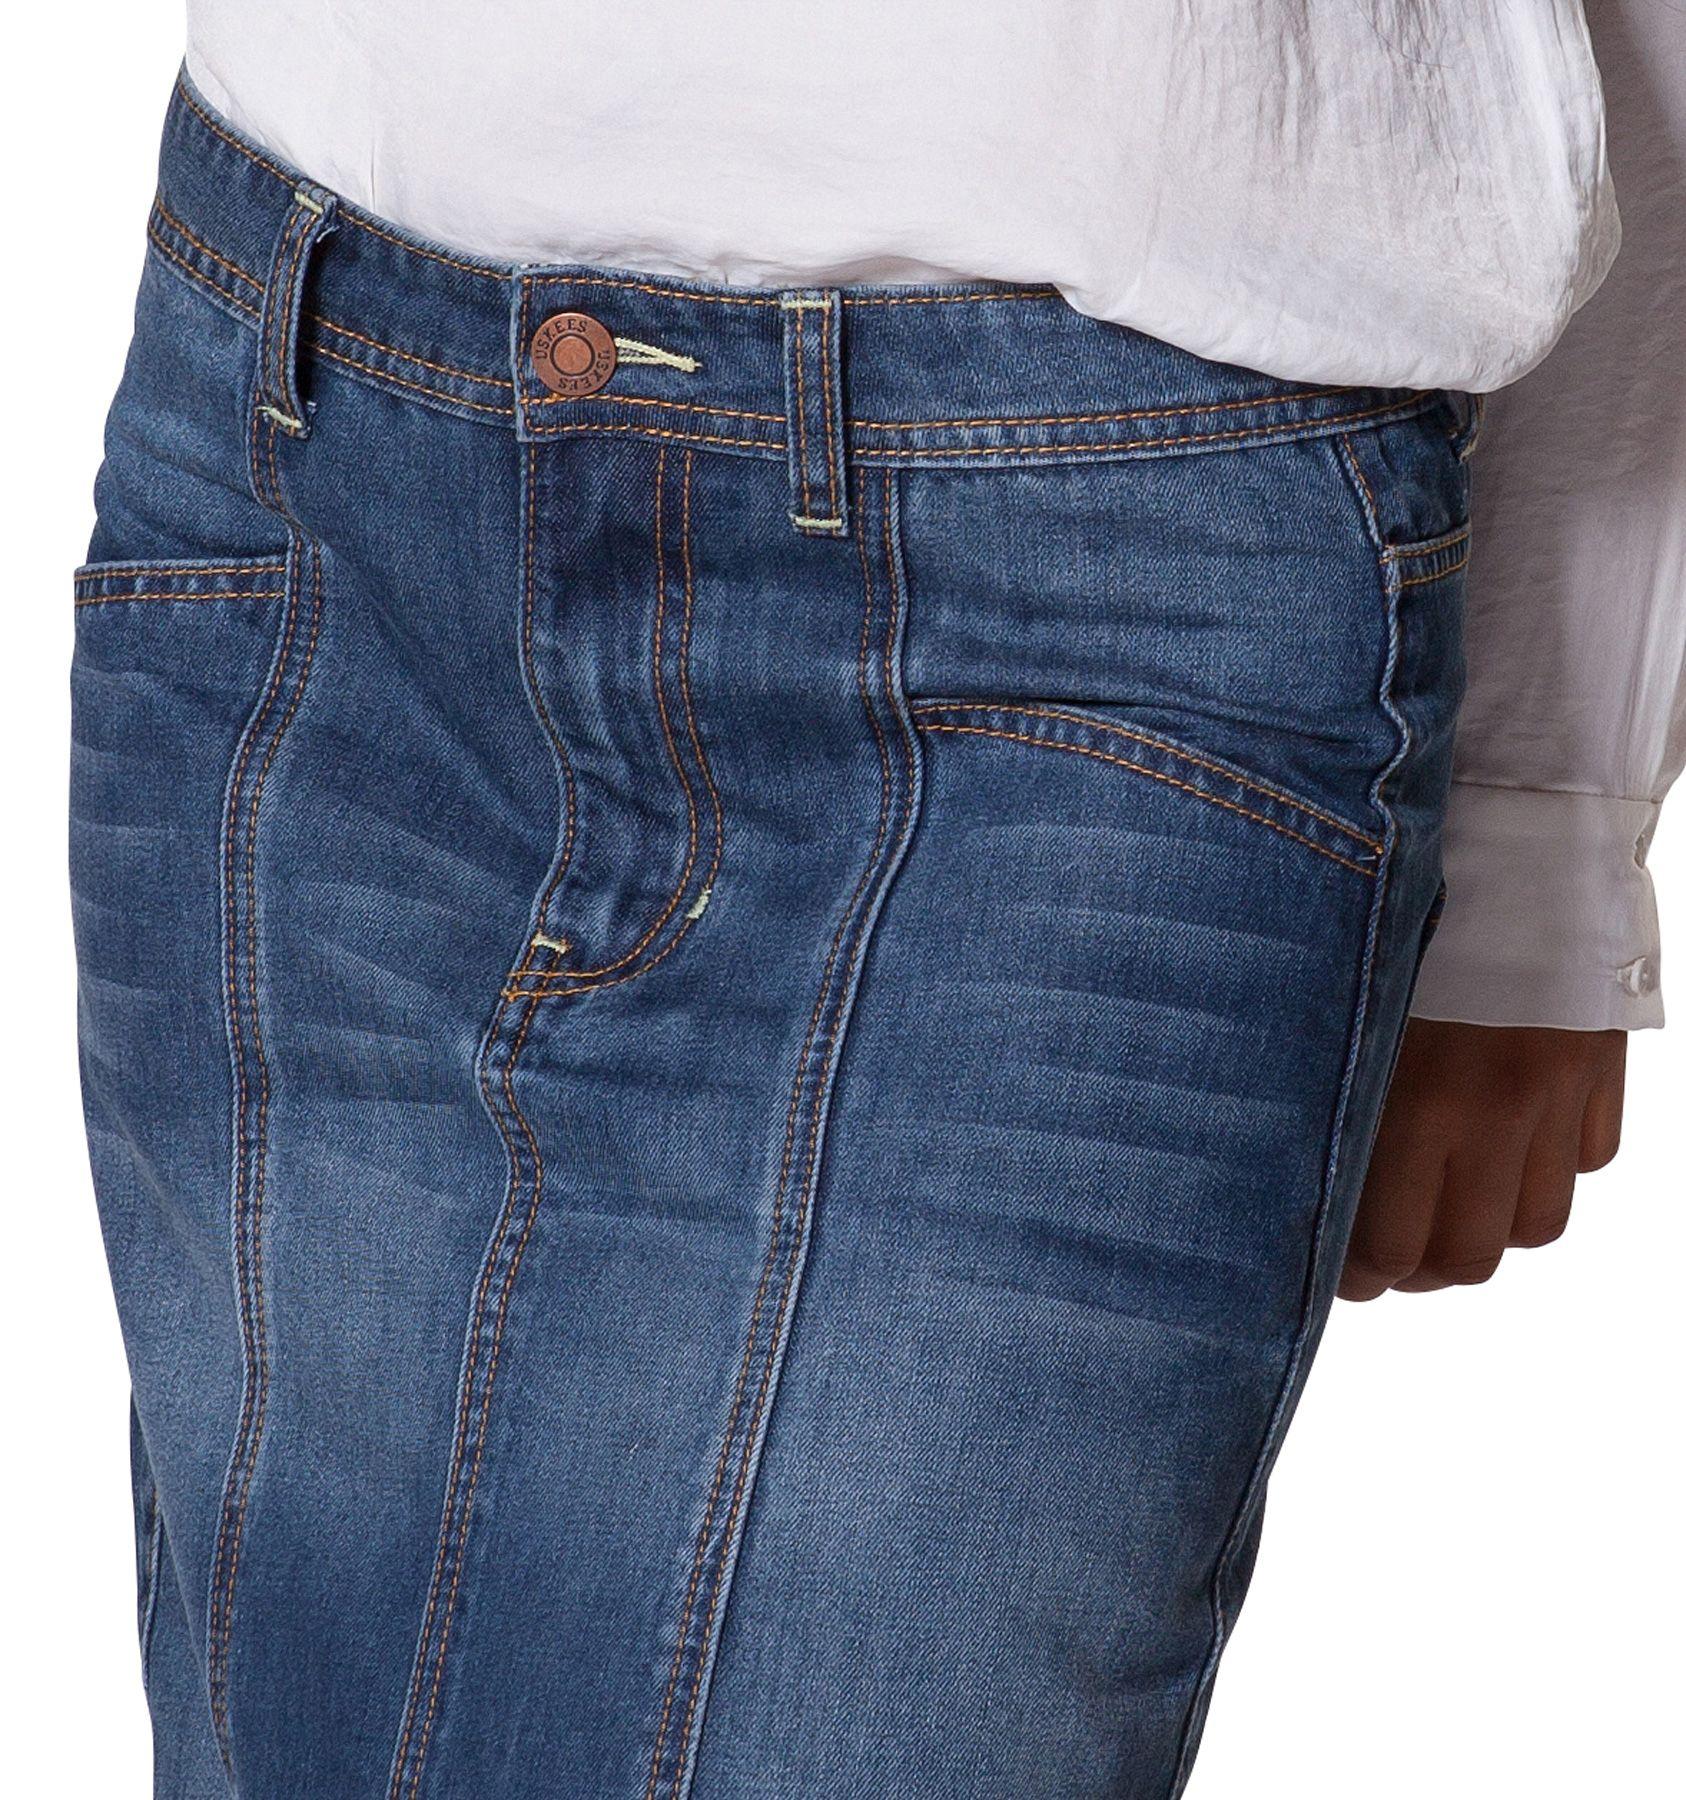 USKEES 'Carole' Long Denim Skirt - quality denim maxi skirt ...